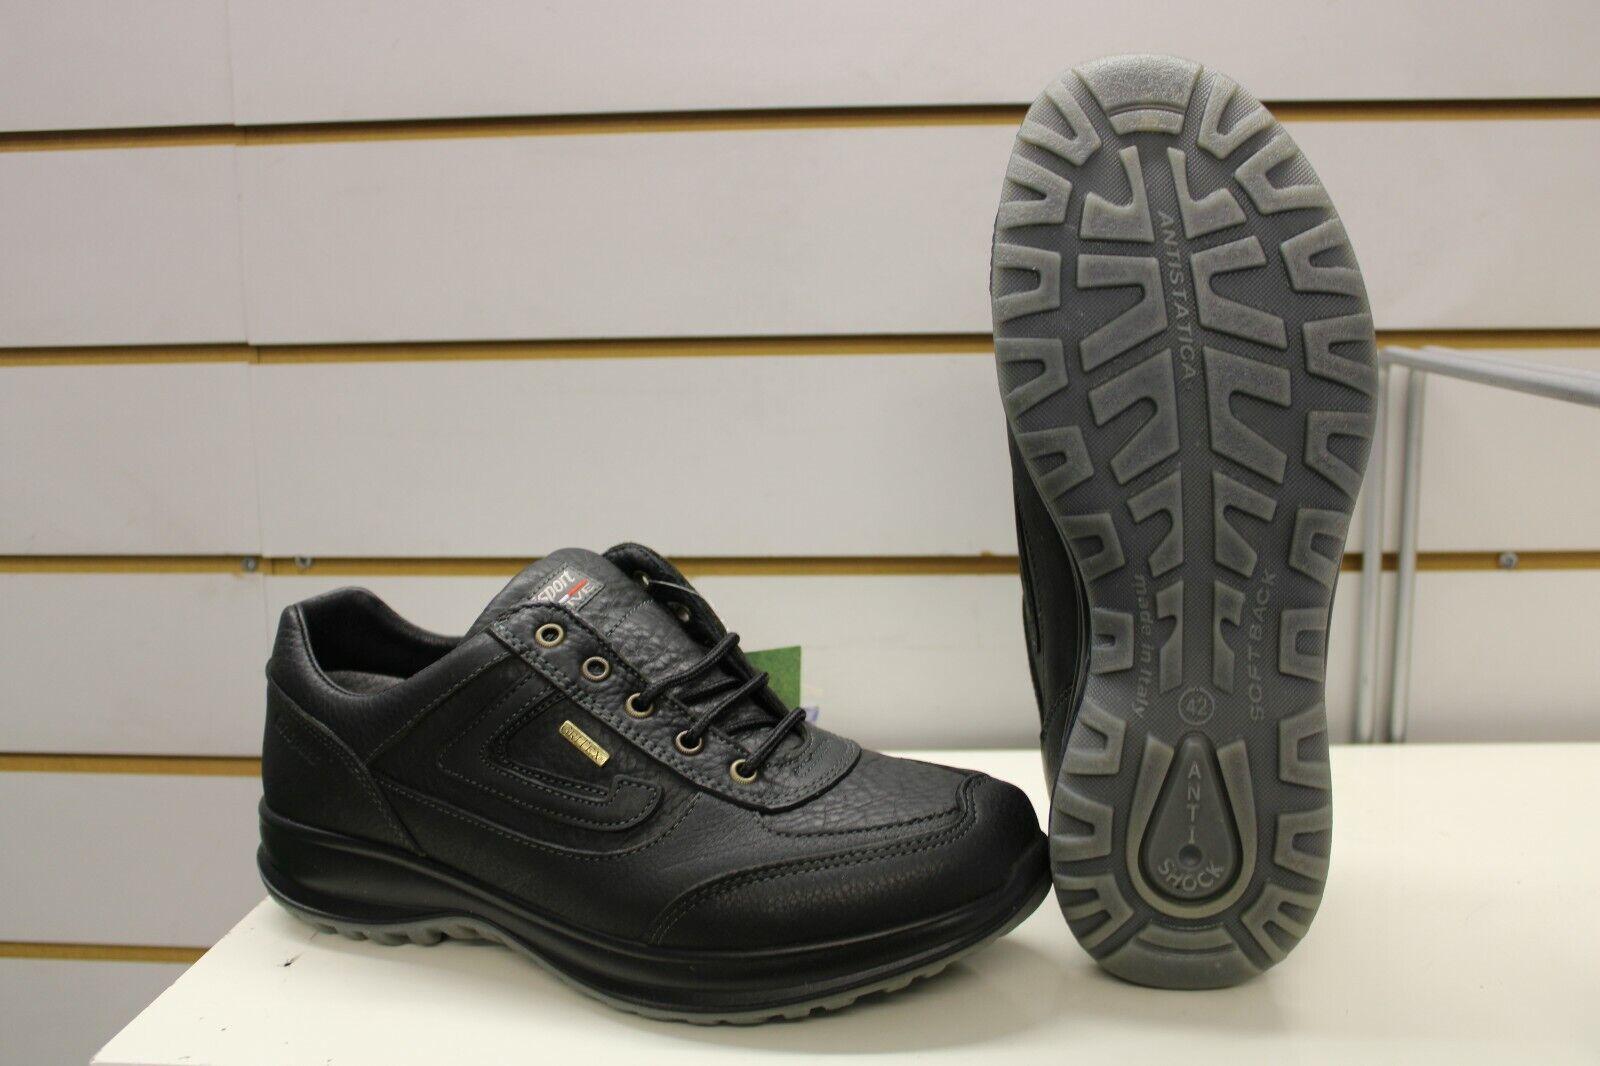 Grisport Airwalker Black Leather Active Leisure Walking Shoes UK 8 EU 42 Italy